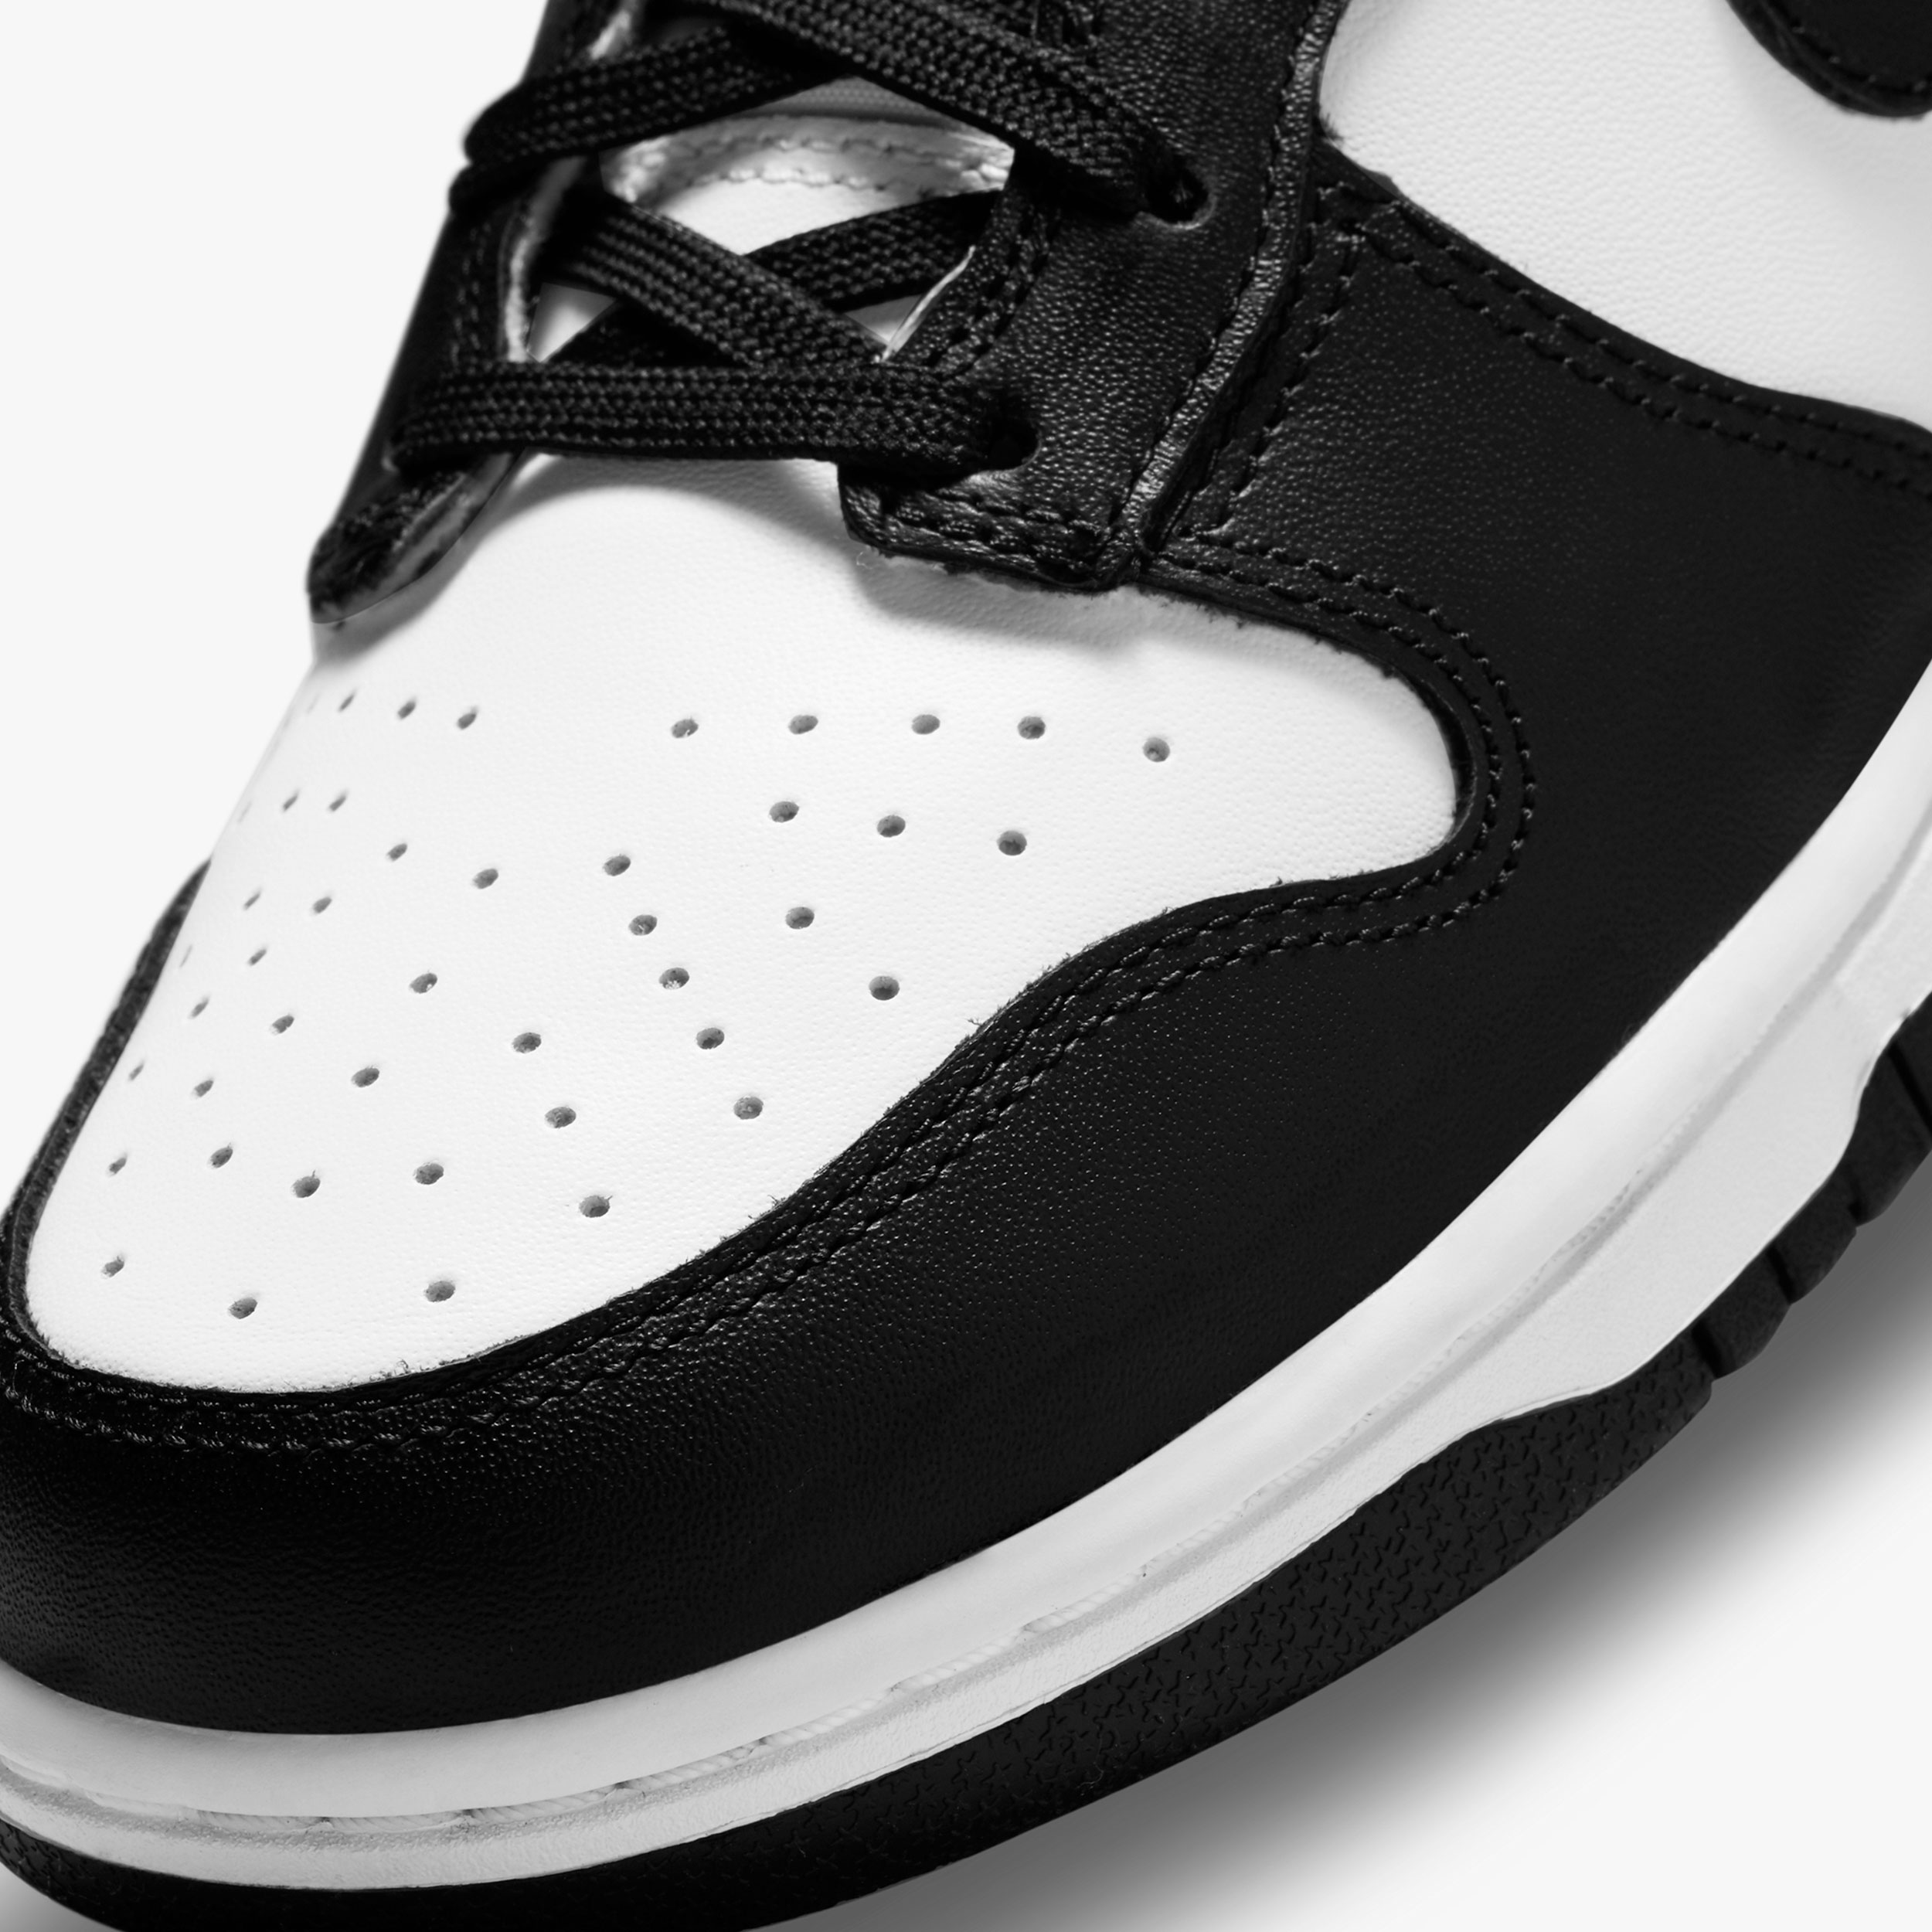 Nike Dunk High Panda White Black DD1869-103